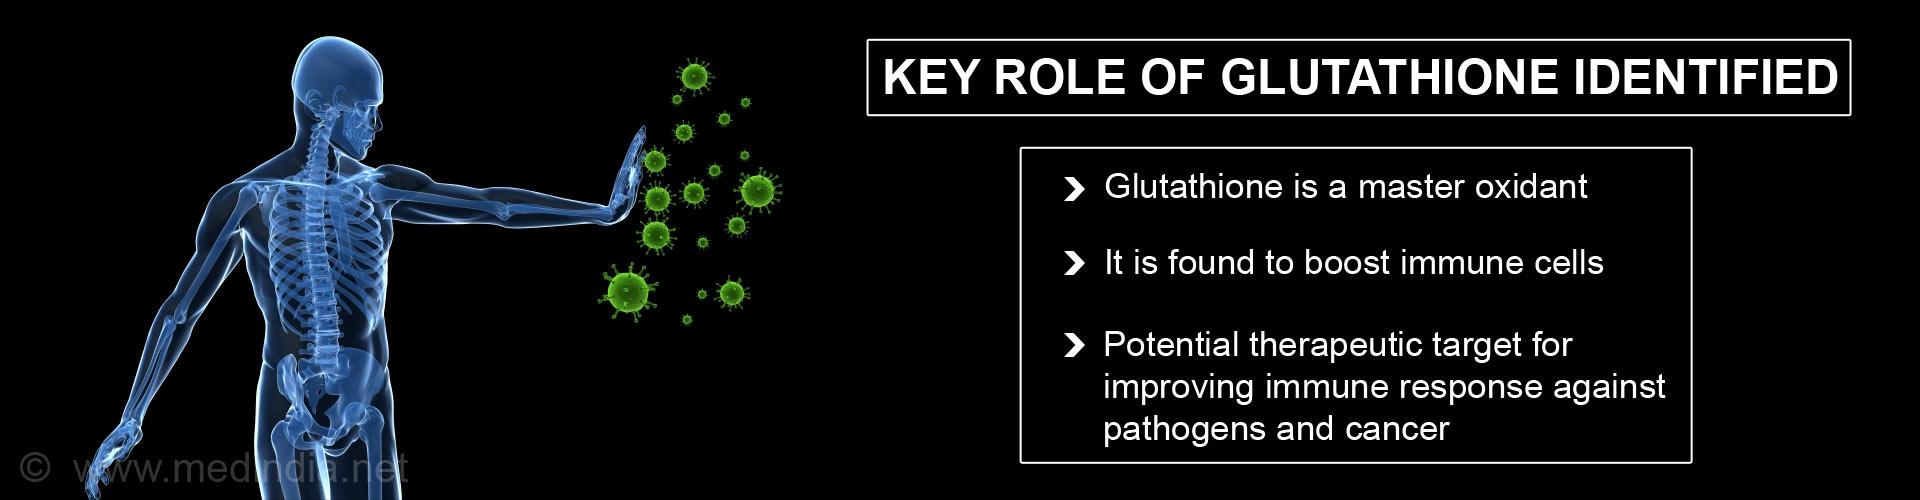 Antioxidant Glutathione Found to Boost Immune System